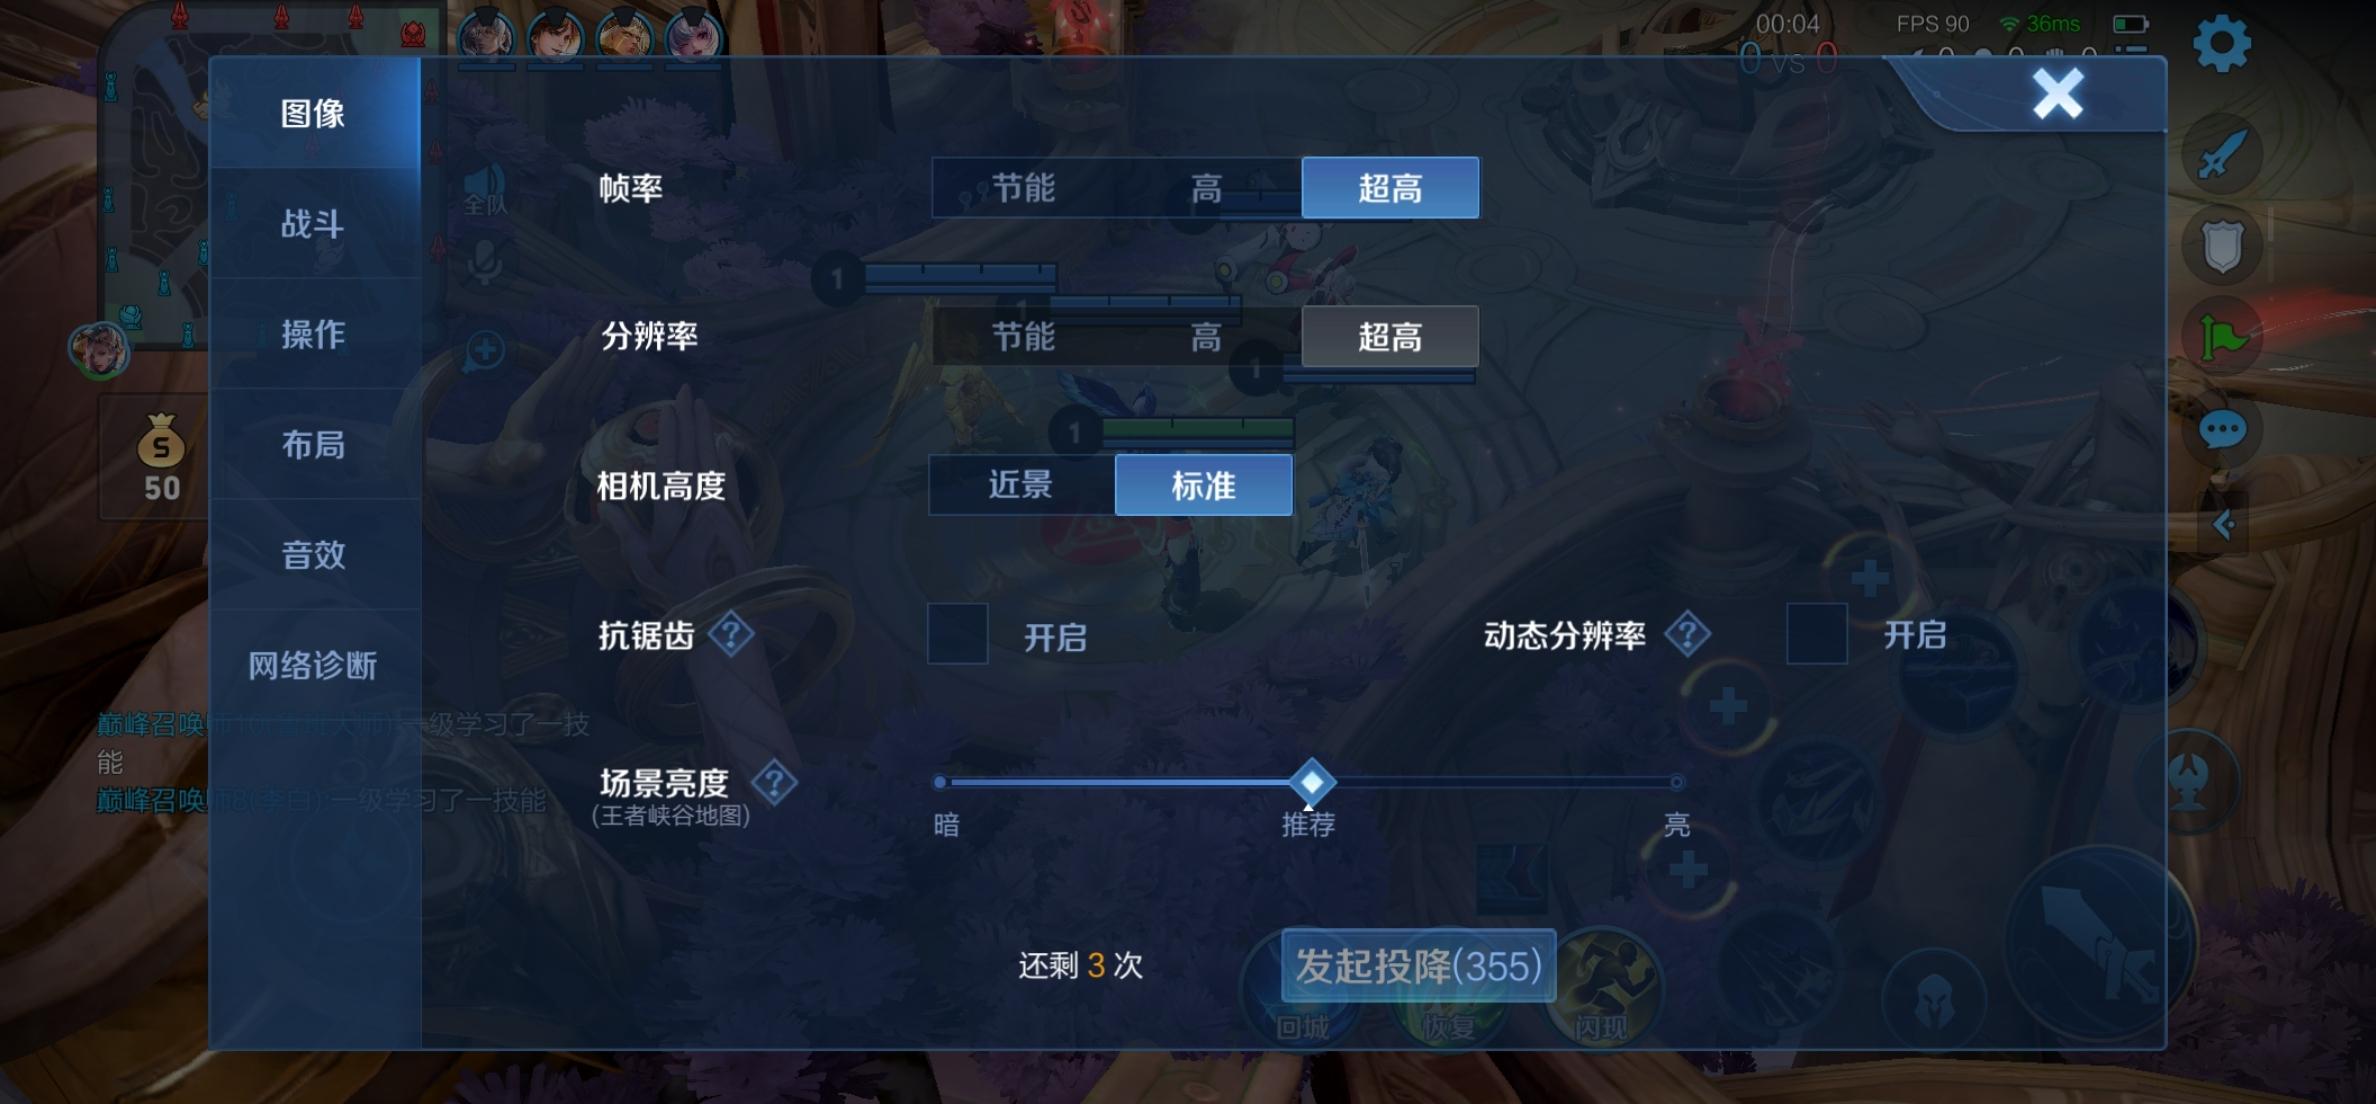 Screenshot_20211012_174125_com.tencent.tmgp.sgame.jpg